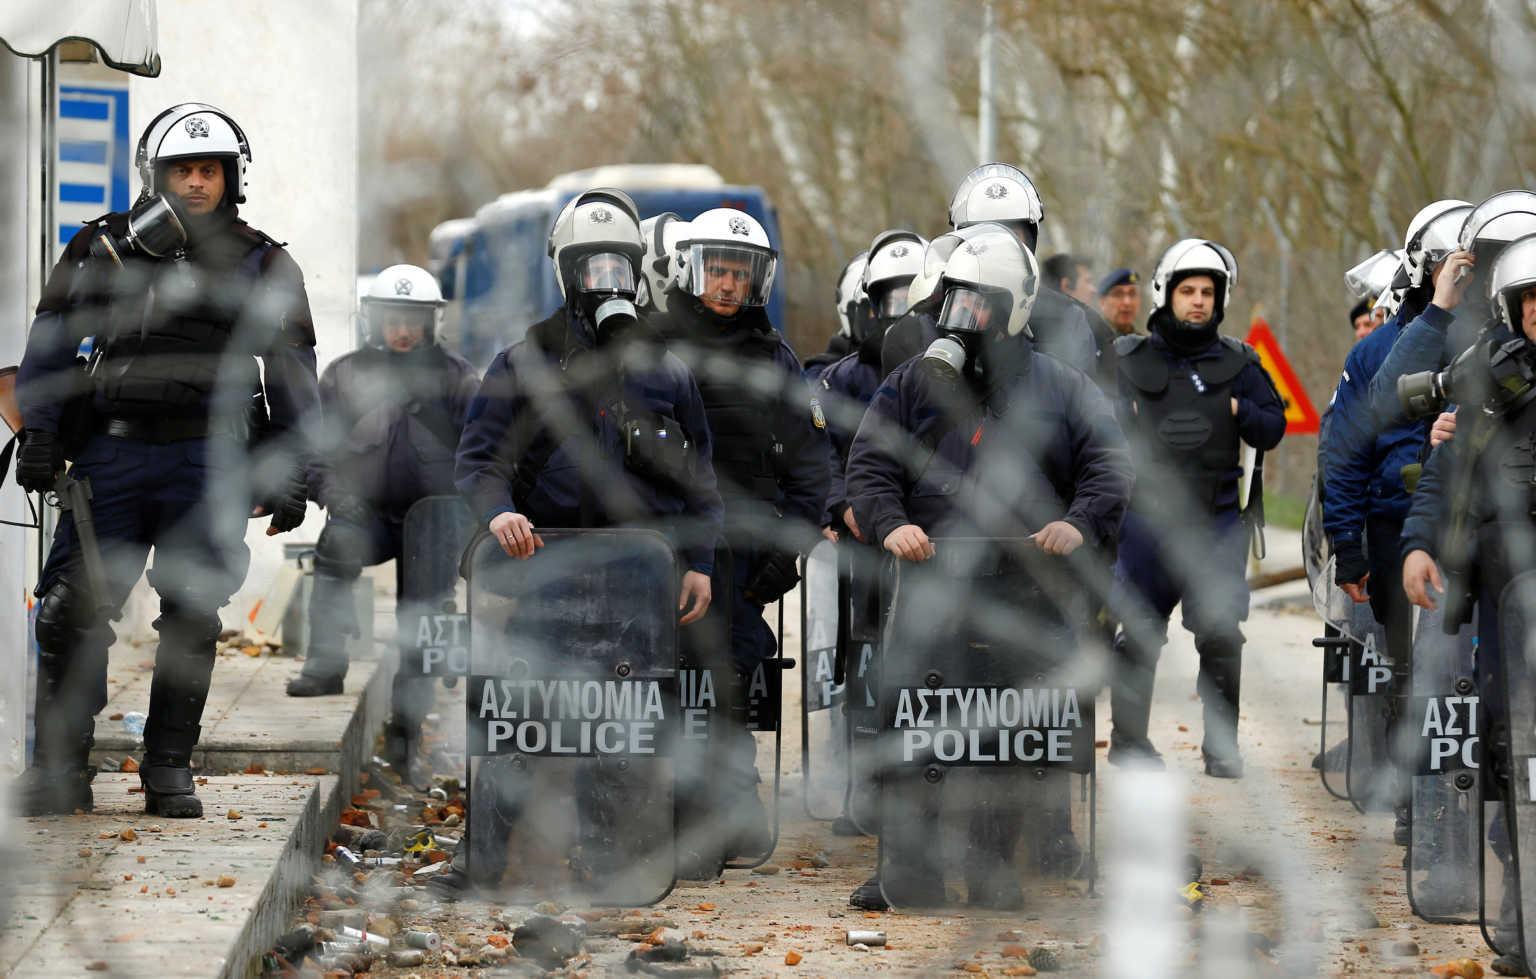 evros_police-1536x979